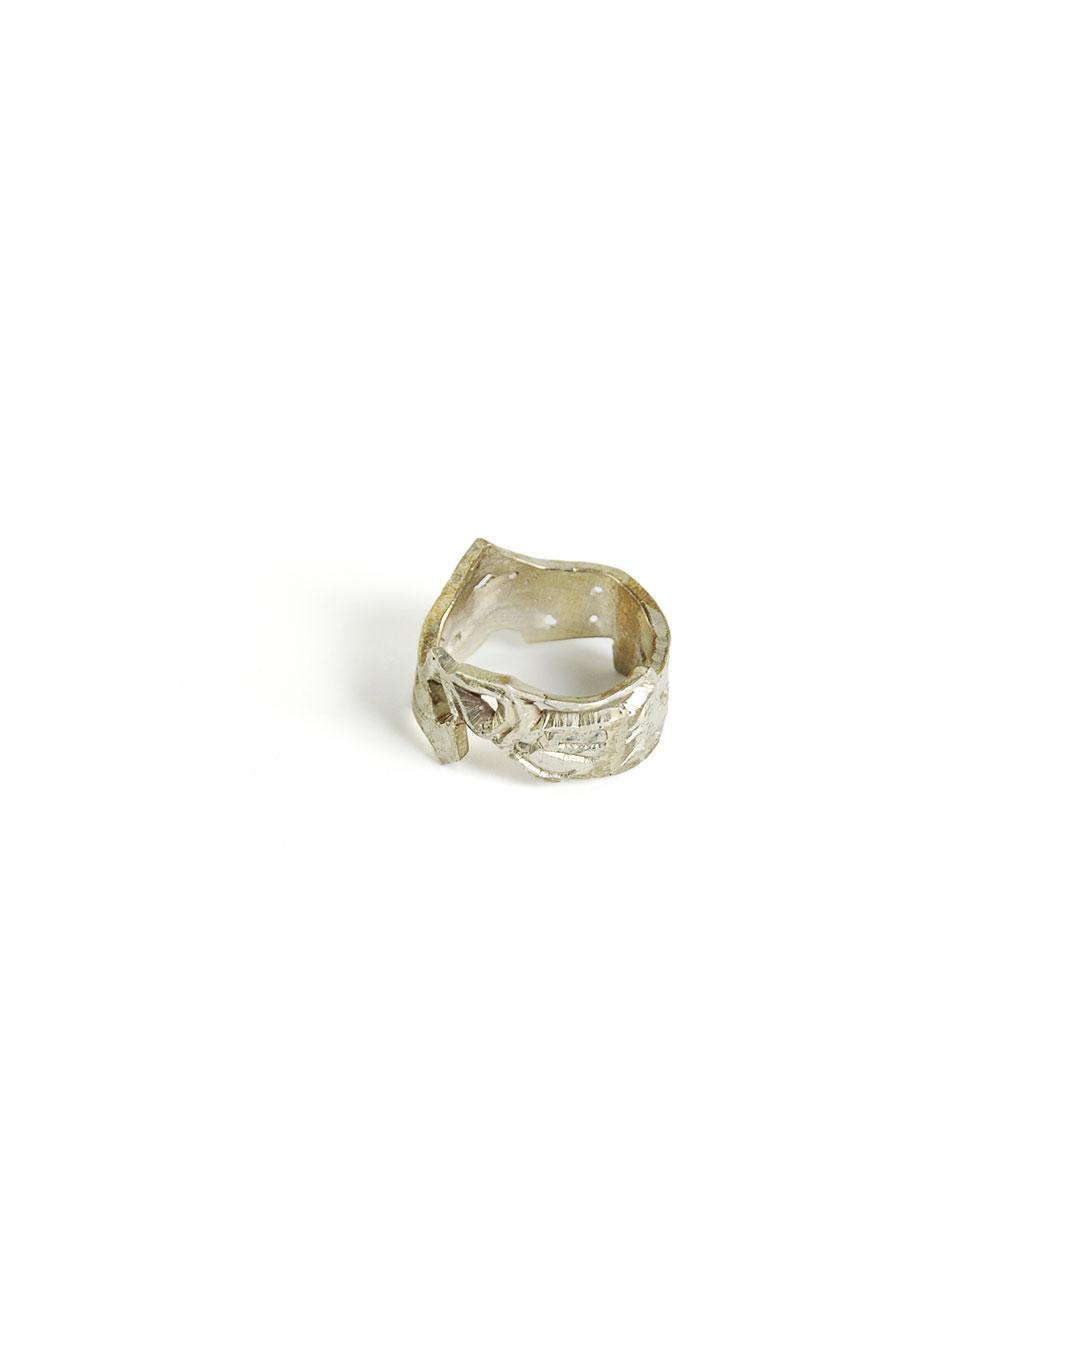 Rudolf Kocéa, zonder titel, 2014, ring; zilverlegering, ø 23 x 15 mm, €680